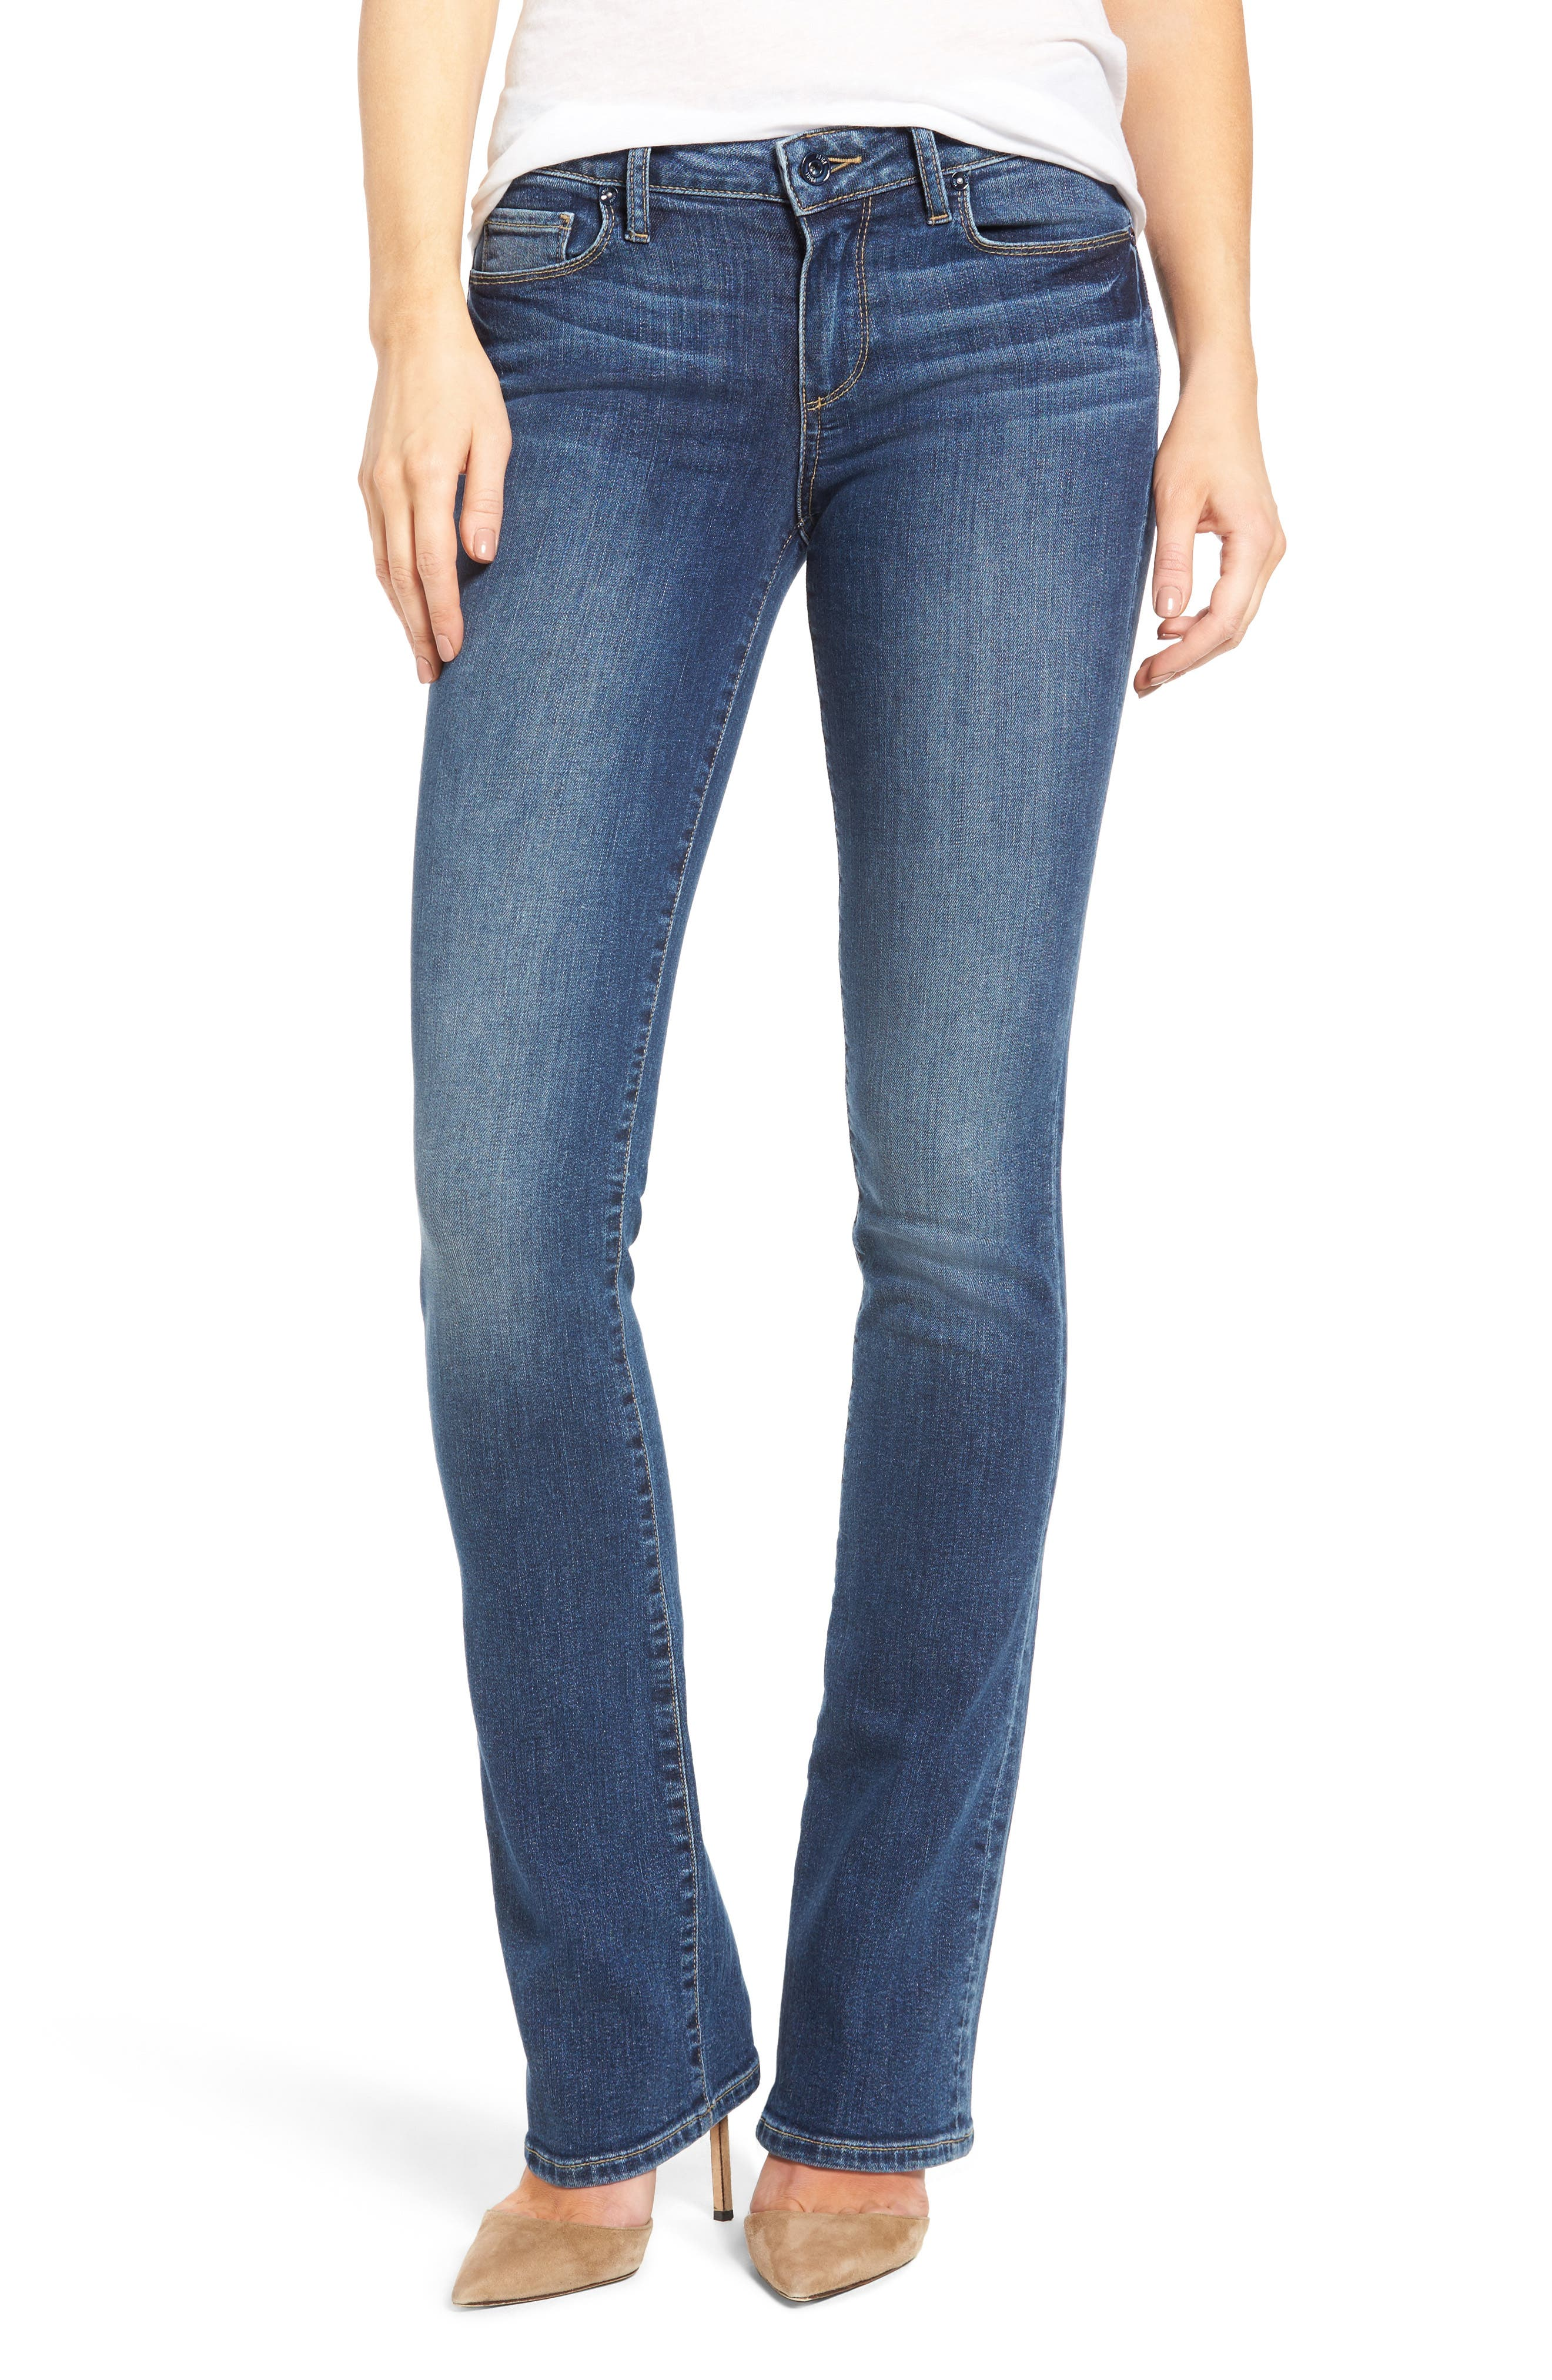 Transcend - Manhattan Bootcut Jeans,                         Main,                         color, 400